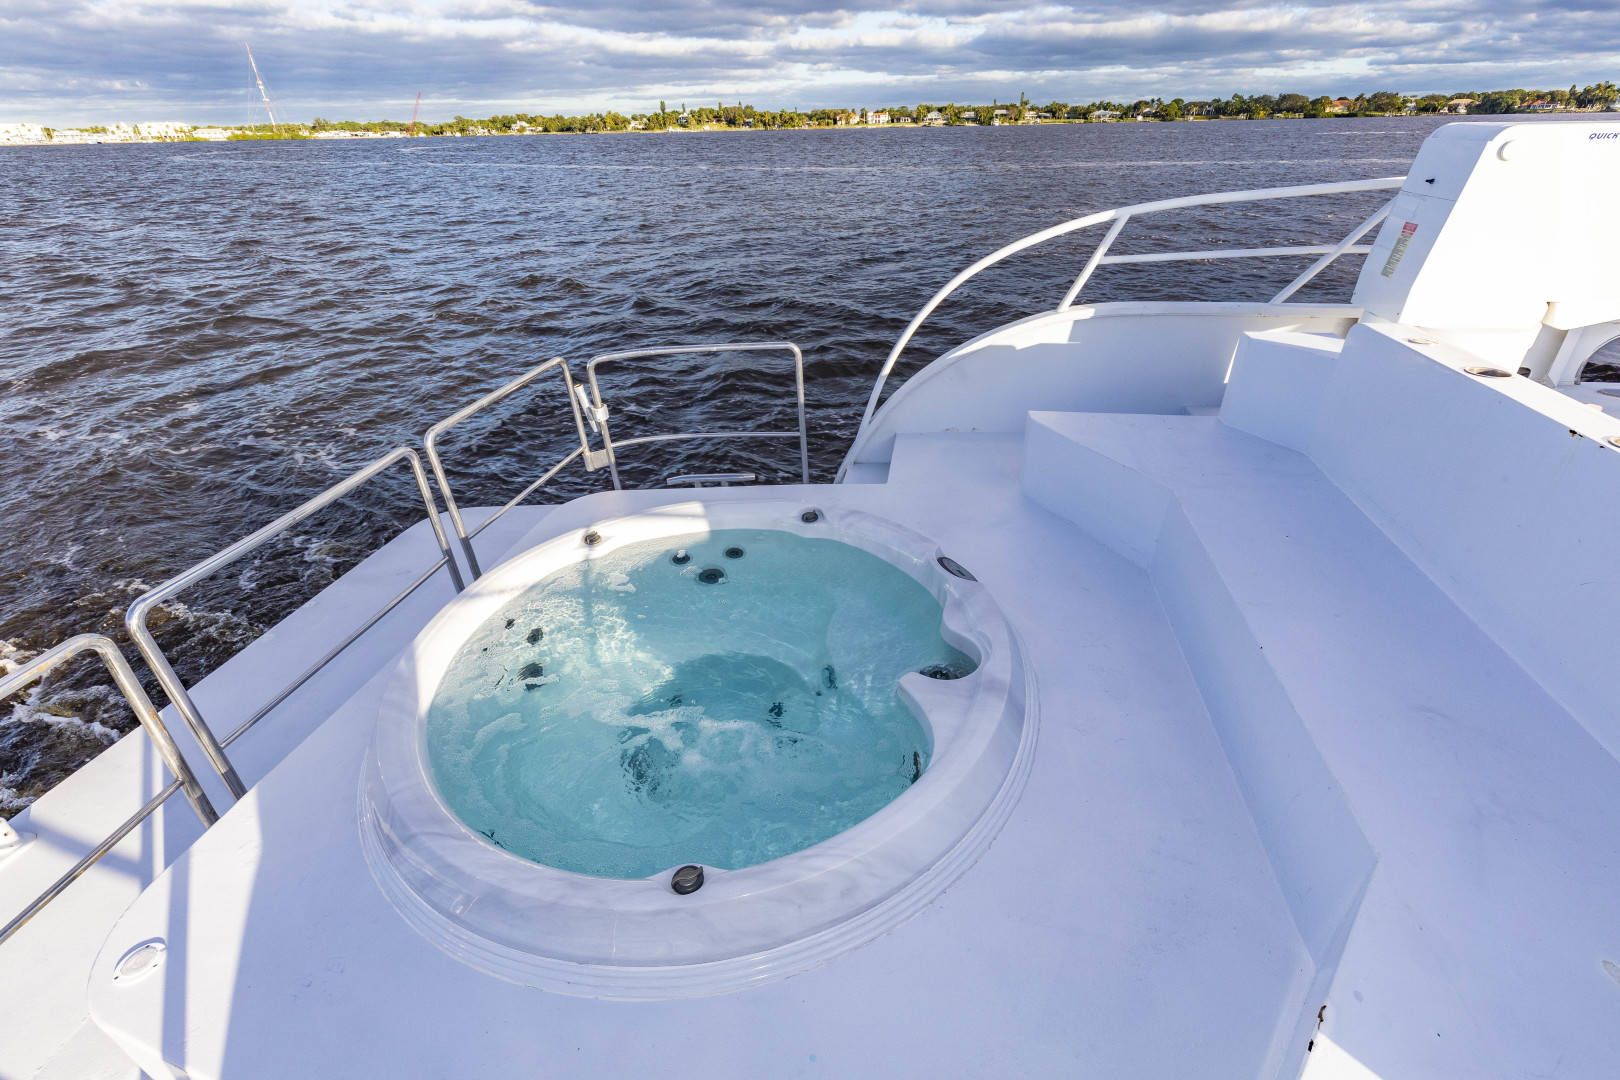 GlassTech-Expedition Yacht 2018-Reset Stuart-Florida-United States-Hot Tub-1568567 | Thumbnail